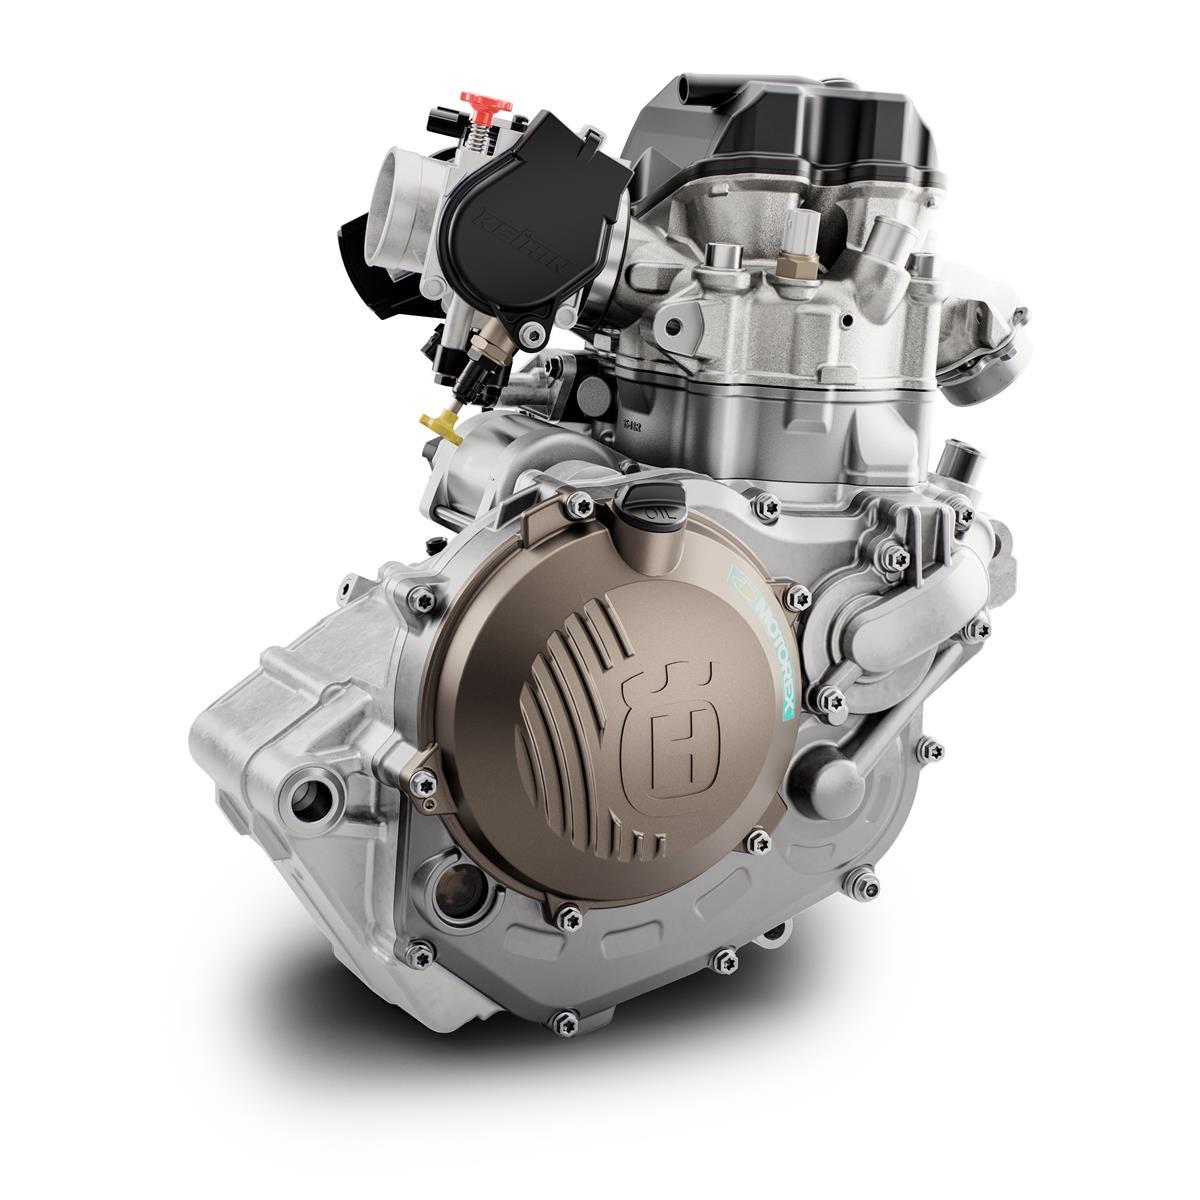 2019 FS 450 Engine